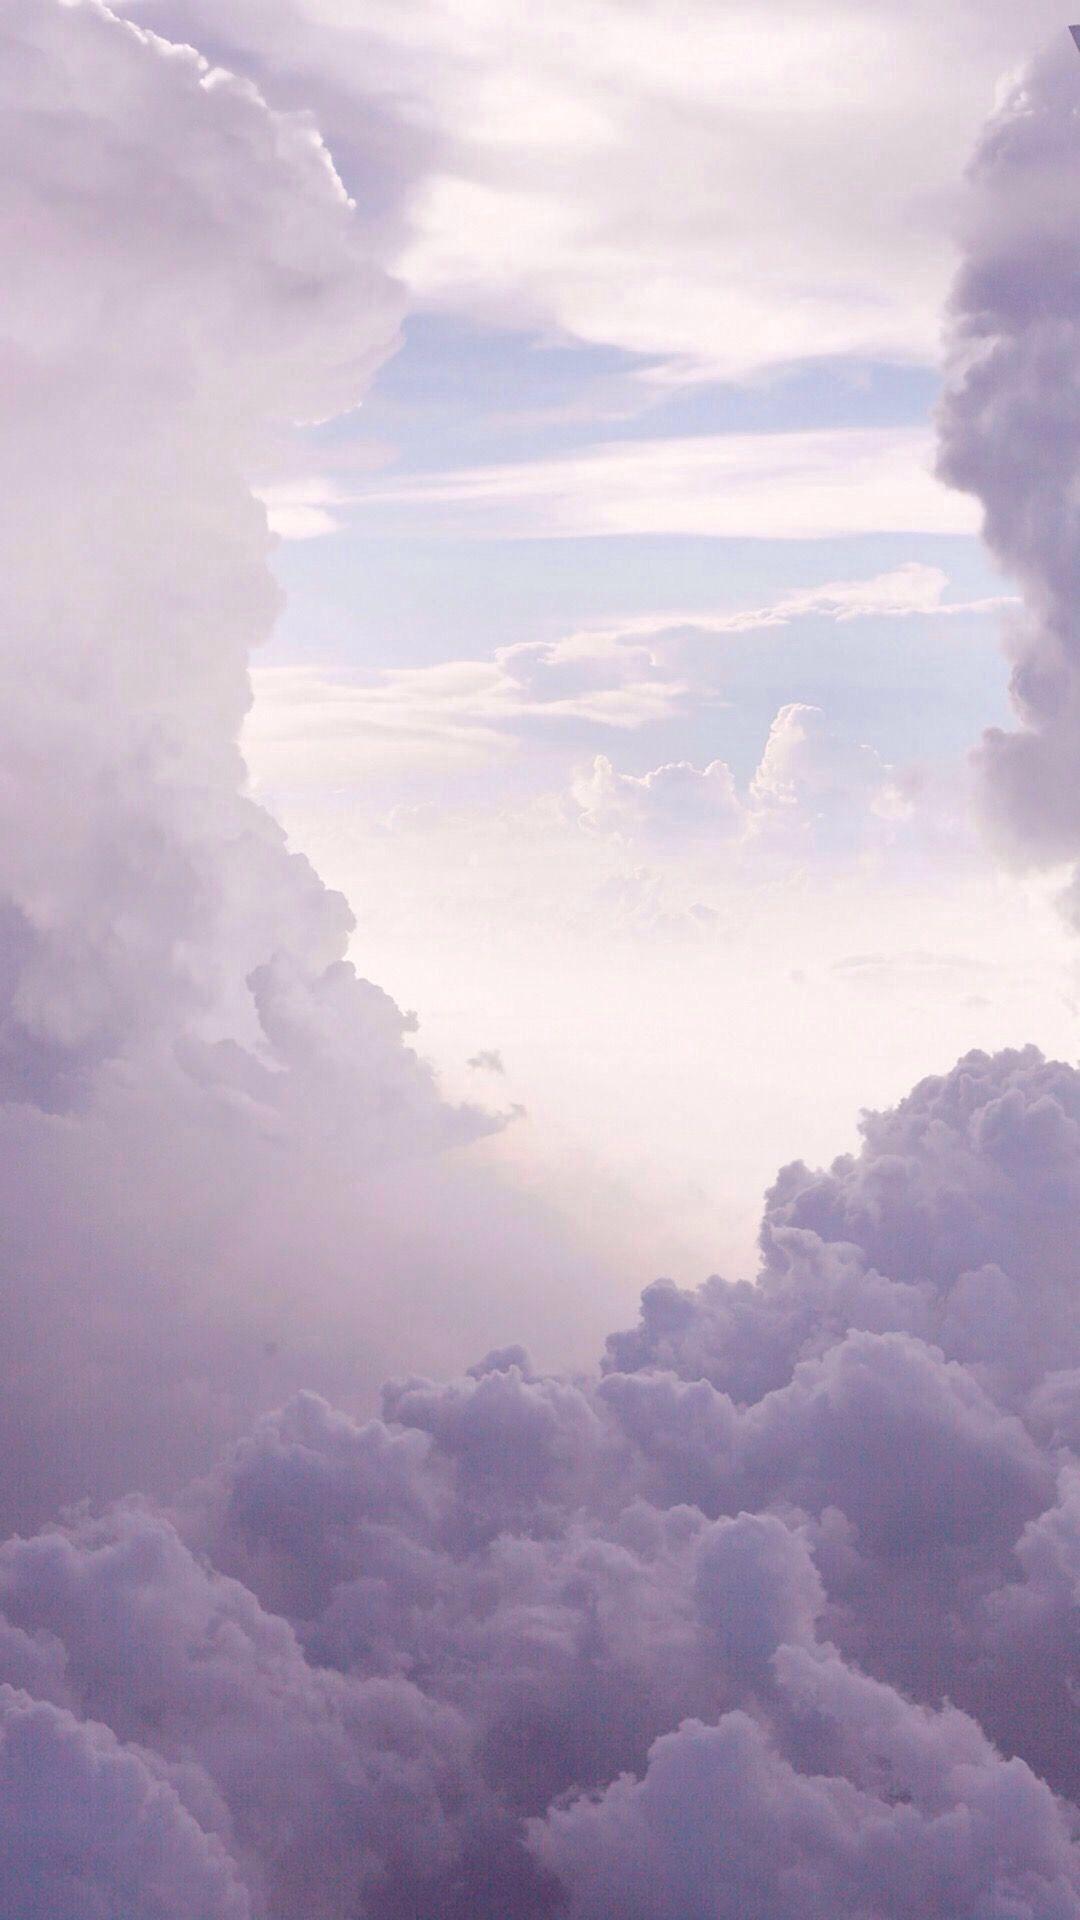 Sunset Sky Sea Of Clouds 1080x1920 Wallpaper Cloud Wallpaper Sky Aesthetic Iphone Wallpaper Sky